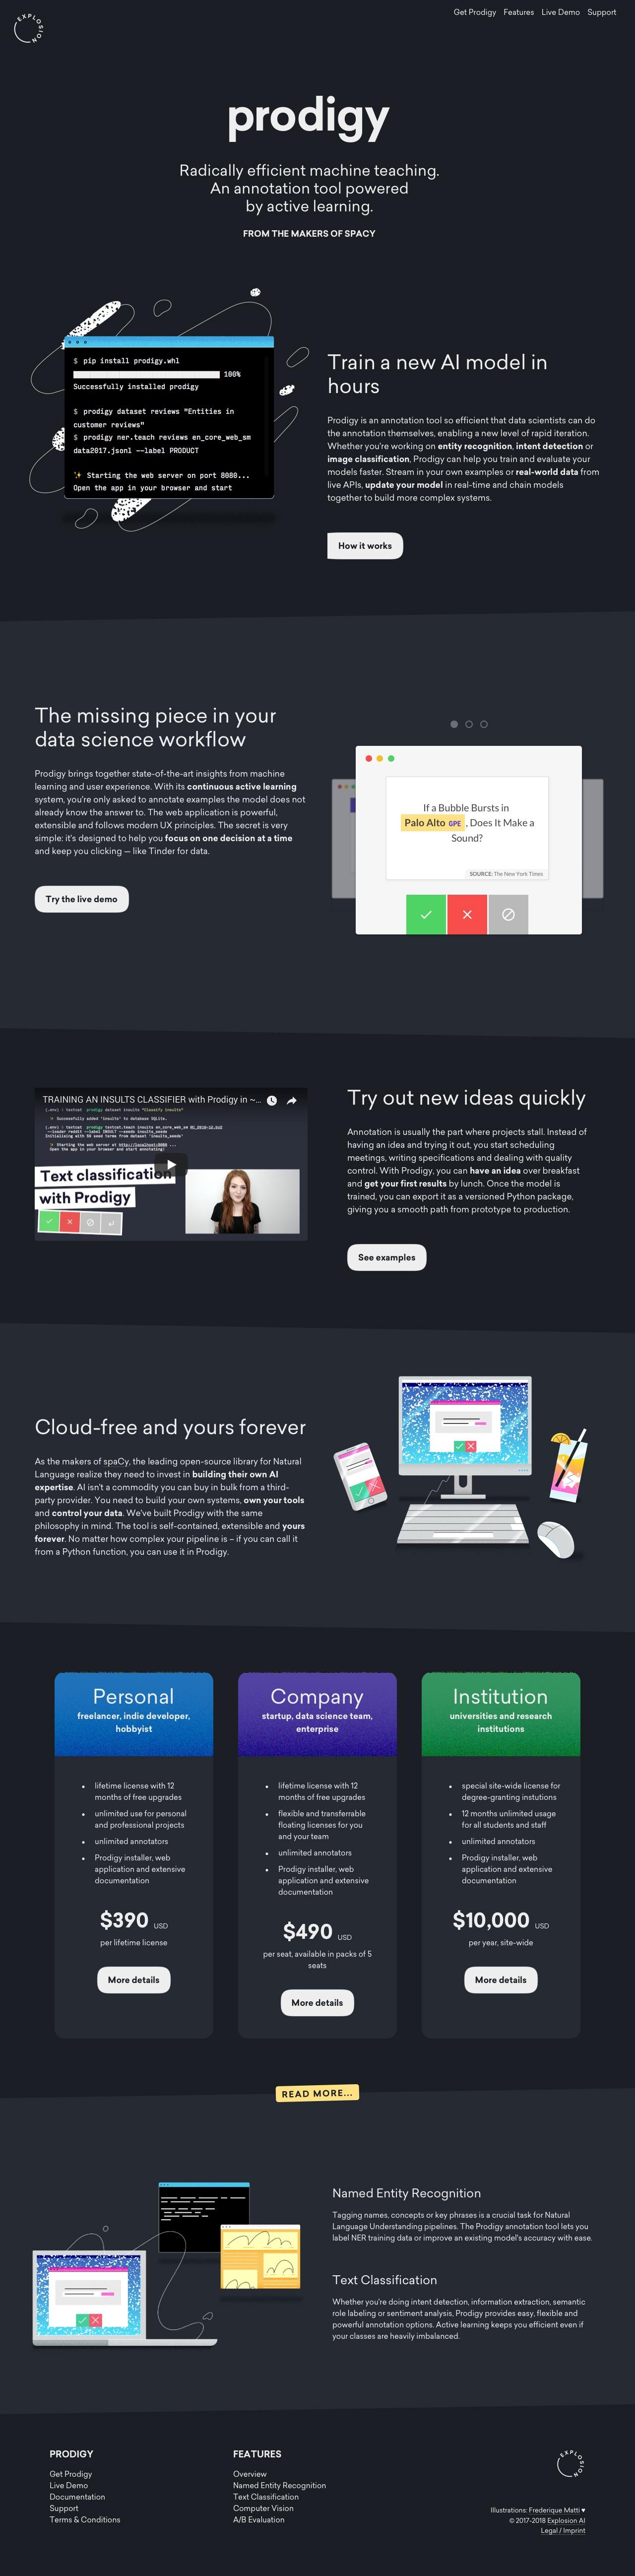 Prodigy landing page design inspiration - Lapa Ninja